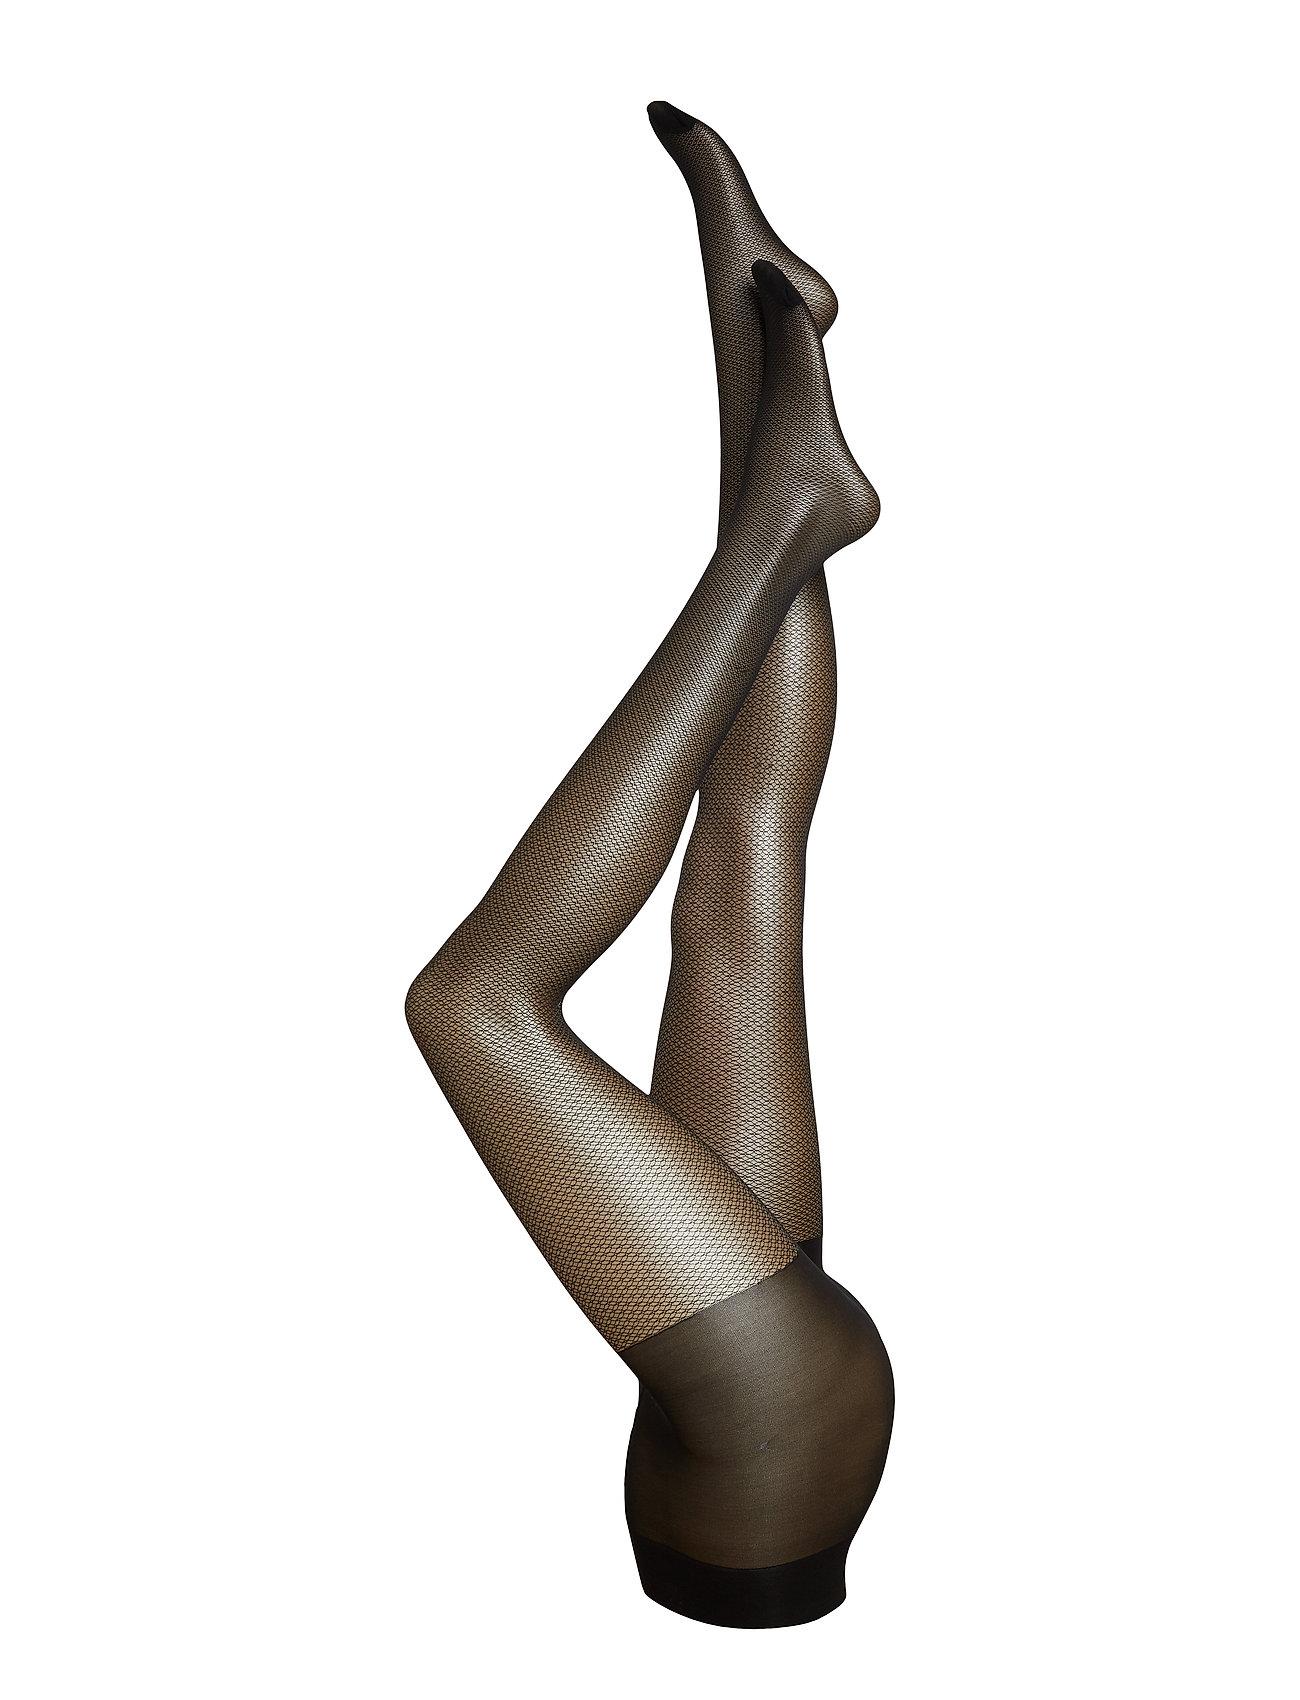 Vogue Ladies den pantyhose, Pearl Support 30